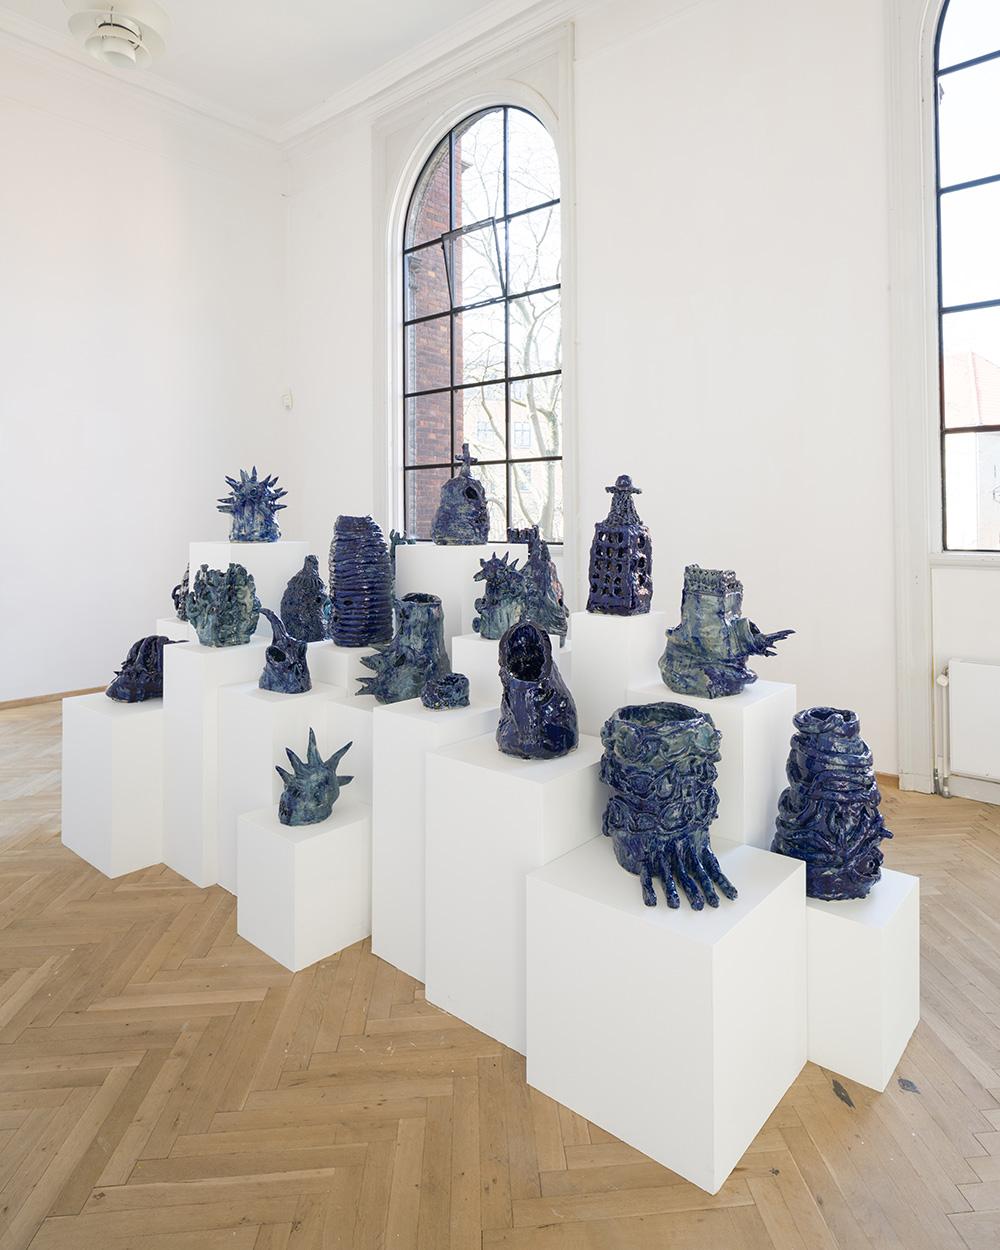 Afgang 2018, Frederik Næblerød, 'Alienated', 2018. Installation view, Kunsthal Charlottenborg, 2018. Photo: David Stjernholm.